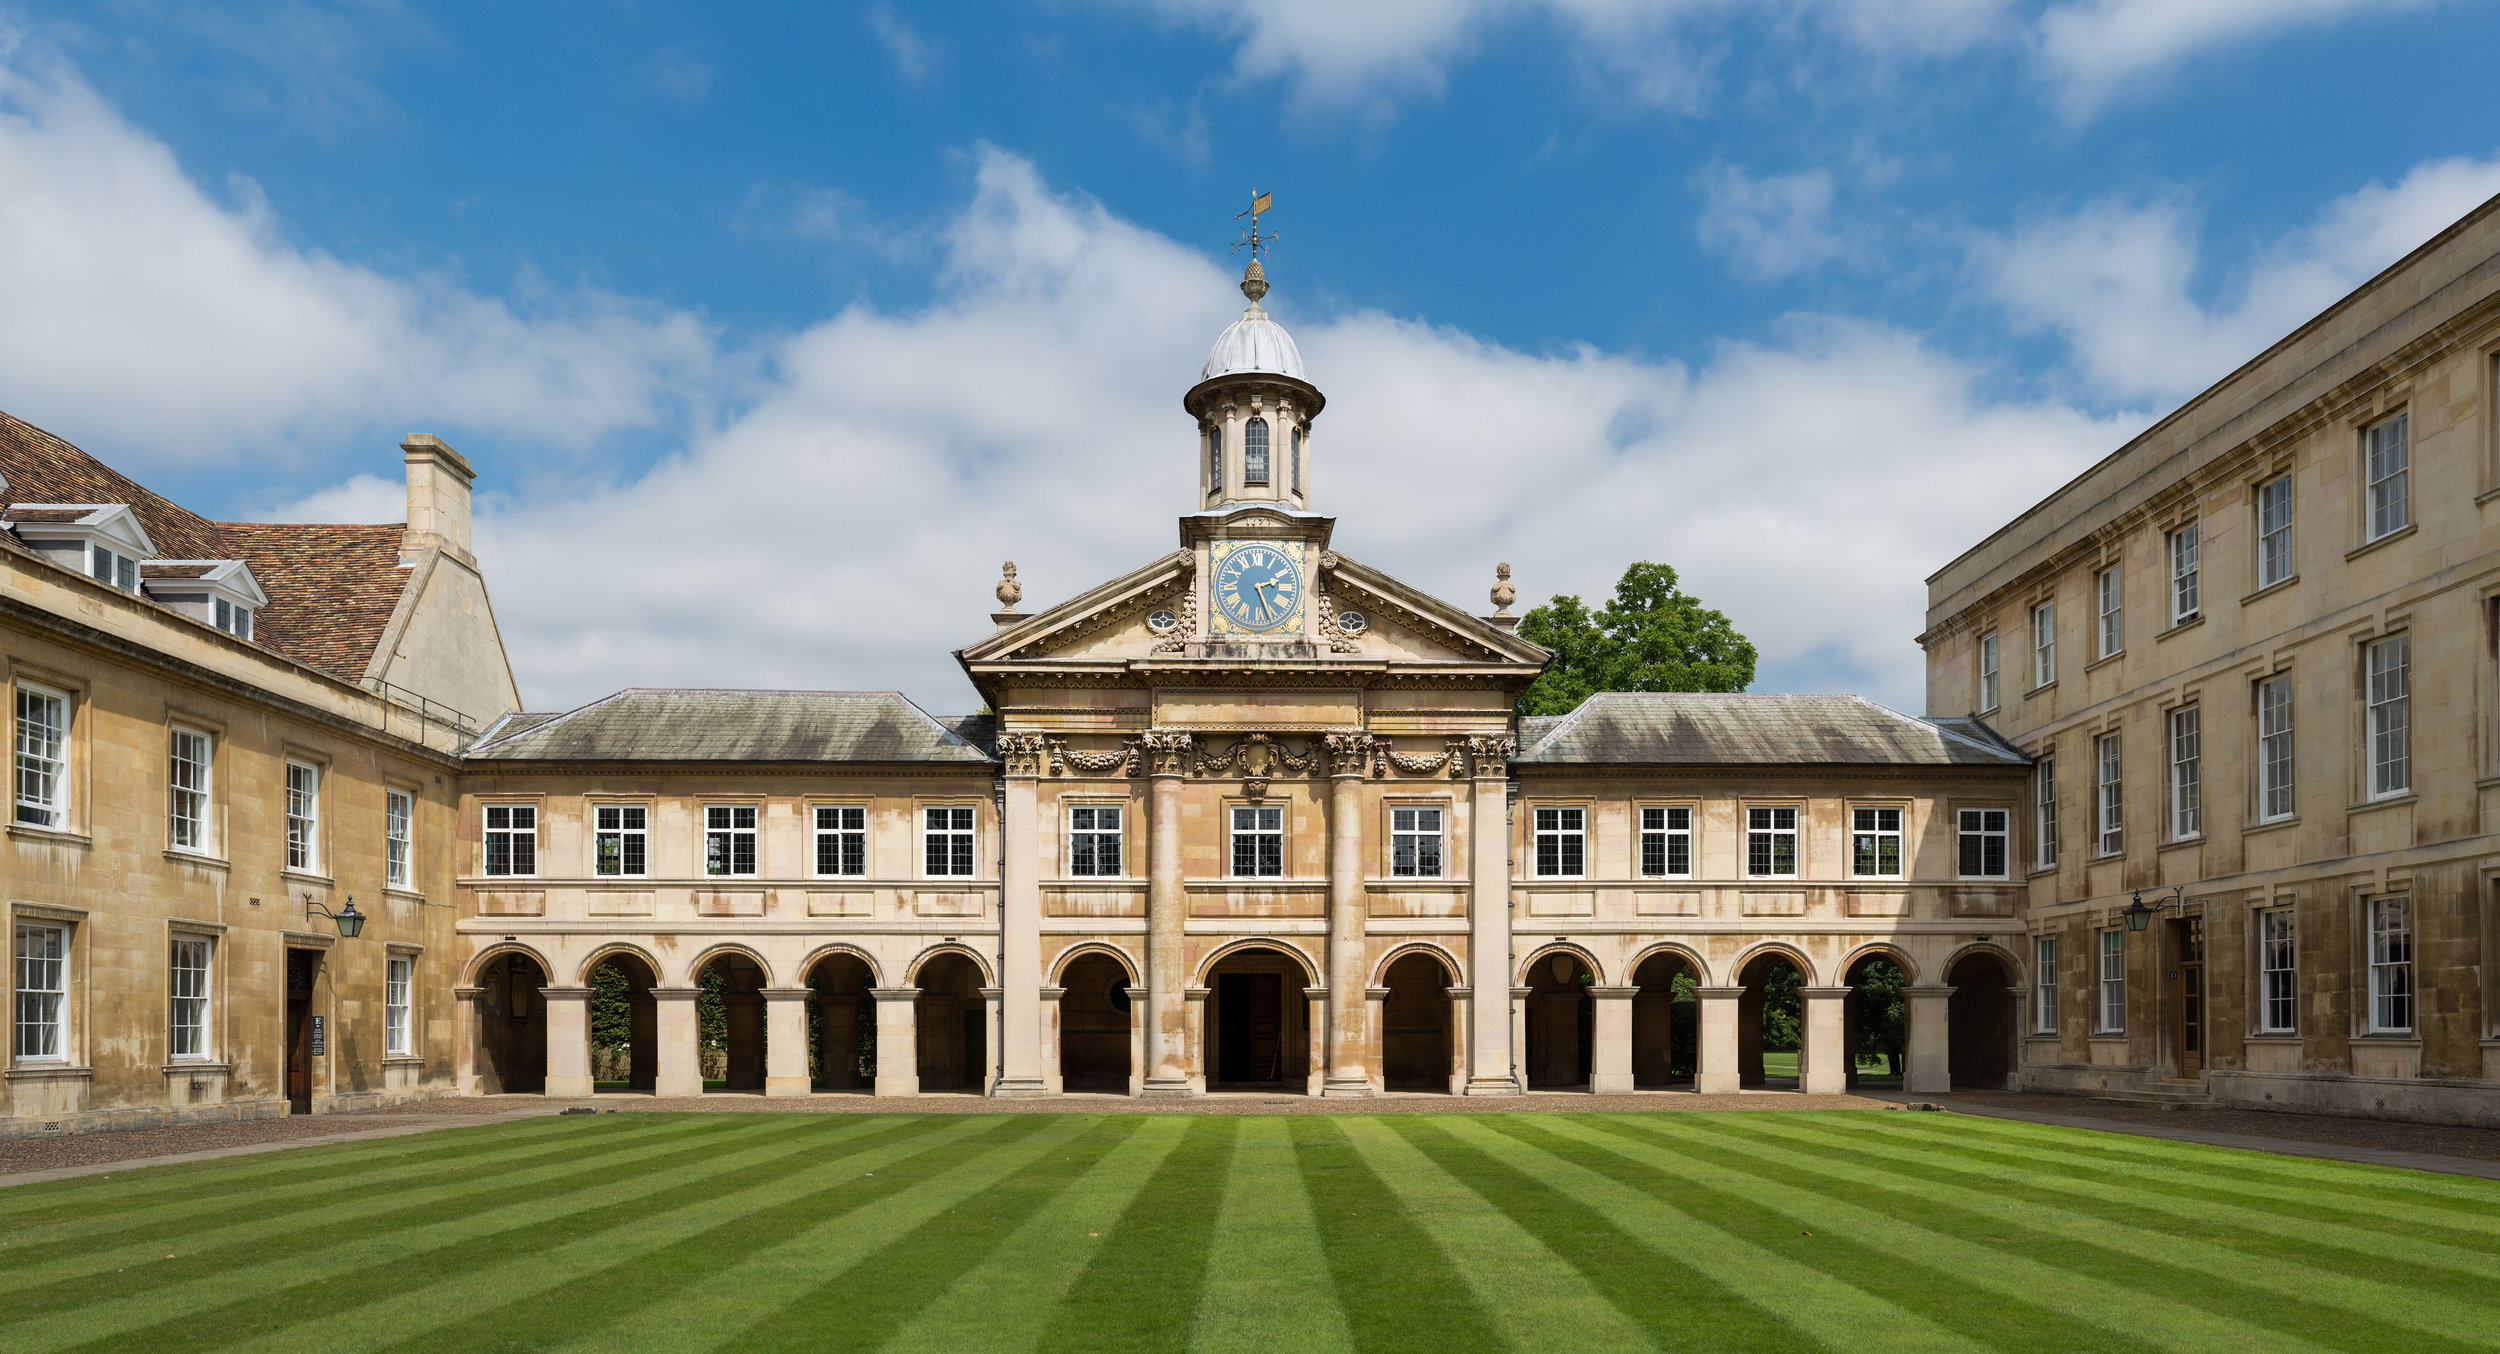 Emmanuel_College_Front_Court,_Cambridge,_UK_-_Diliff.jpg